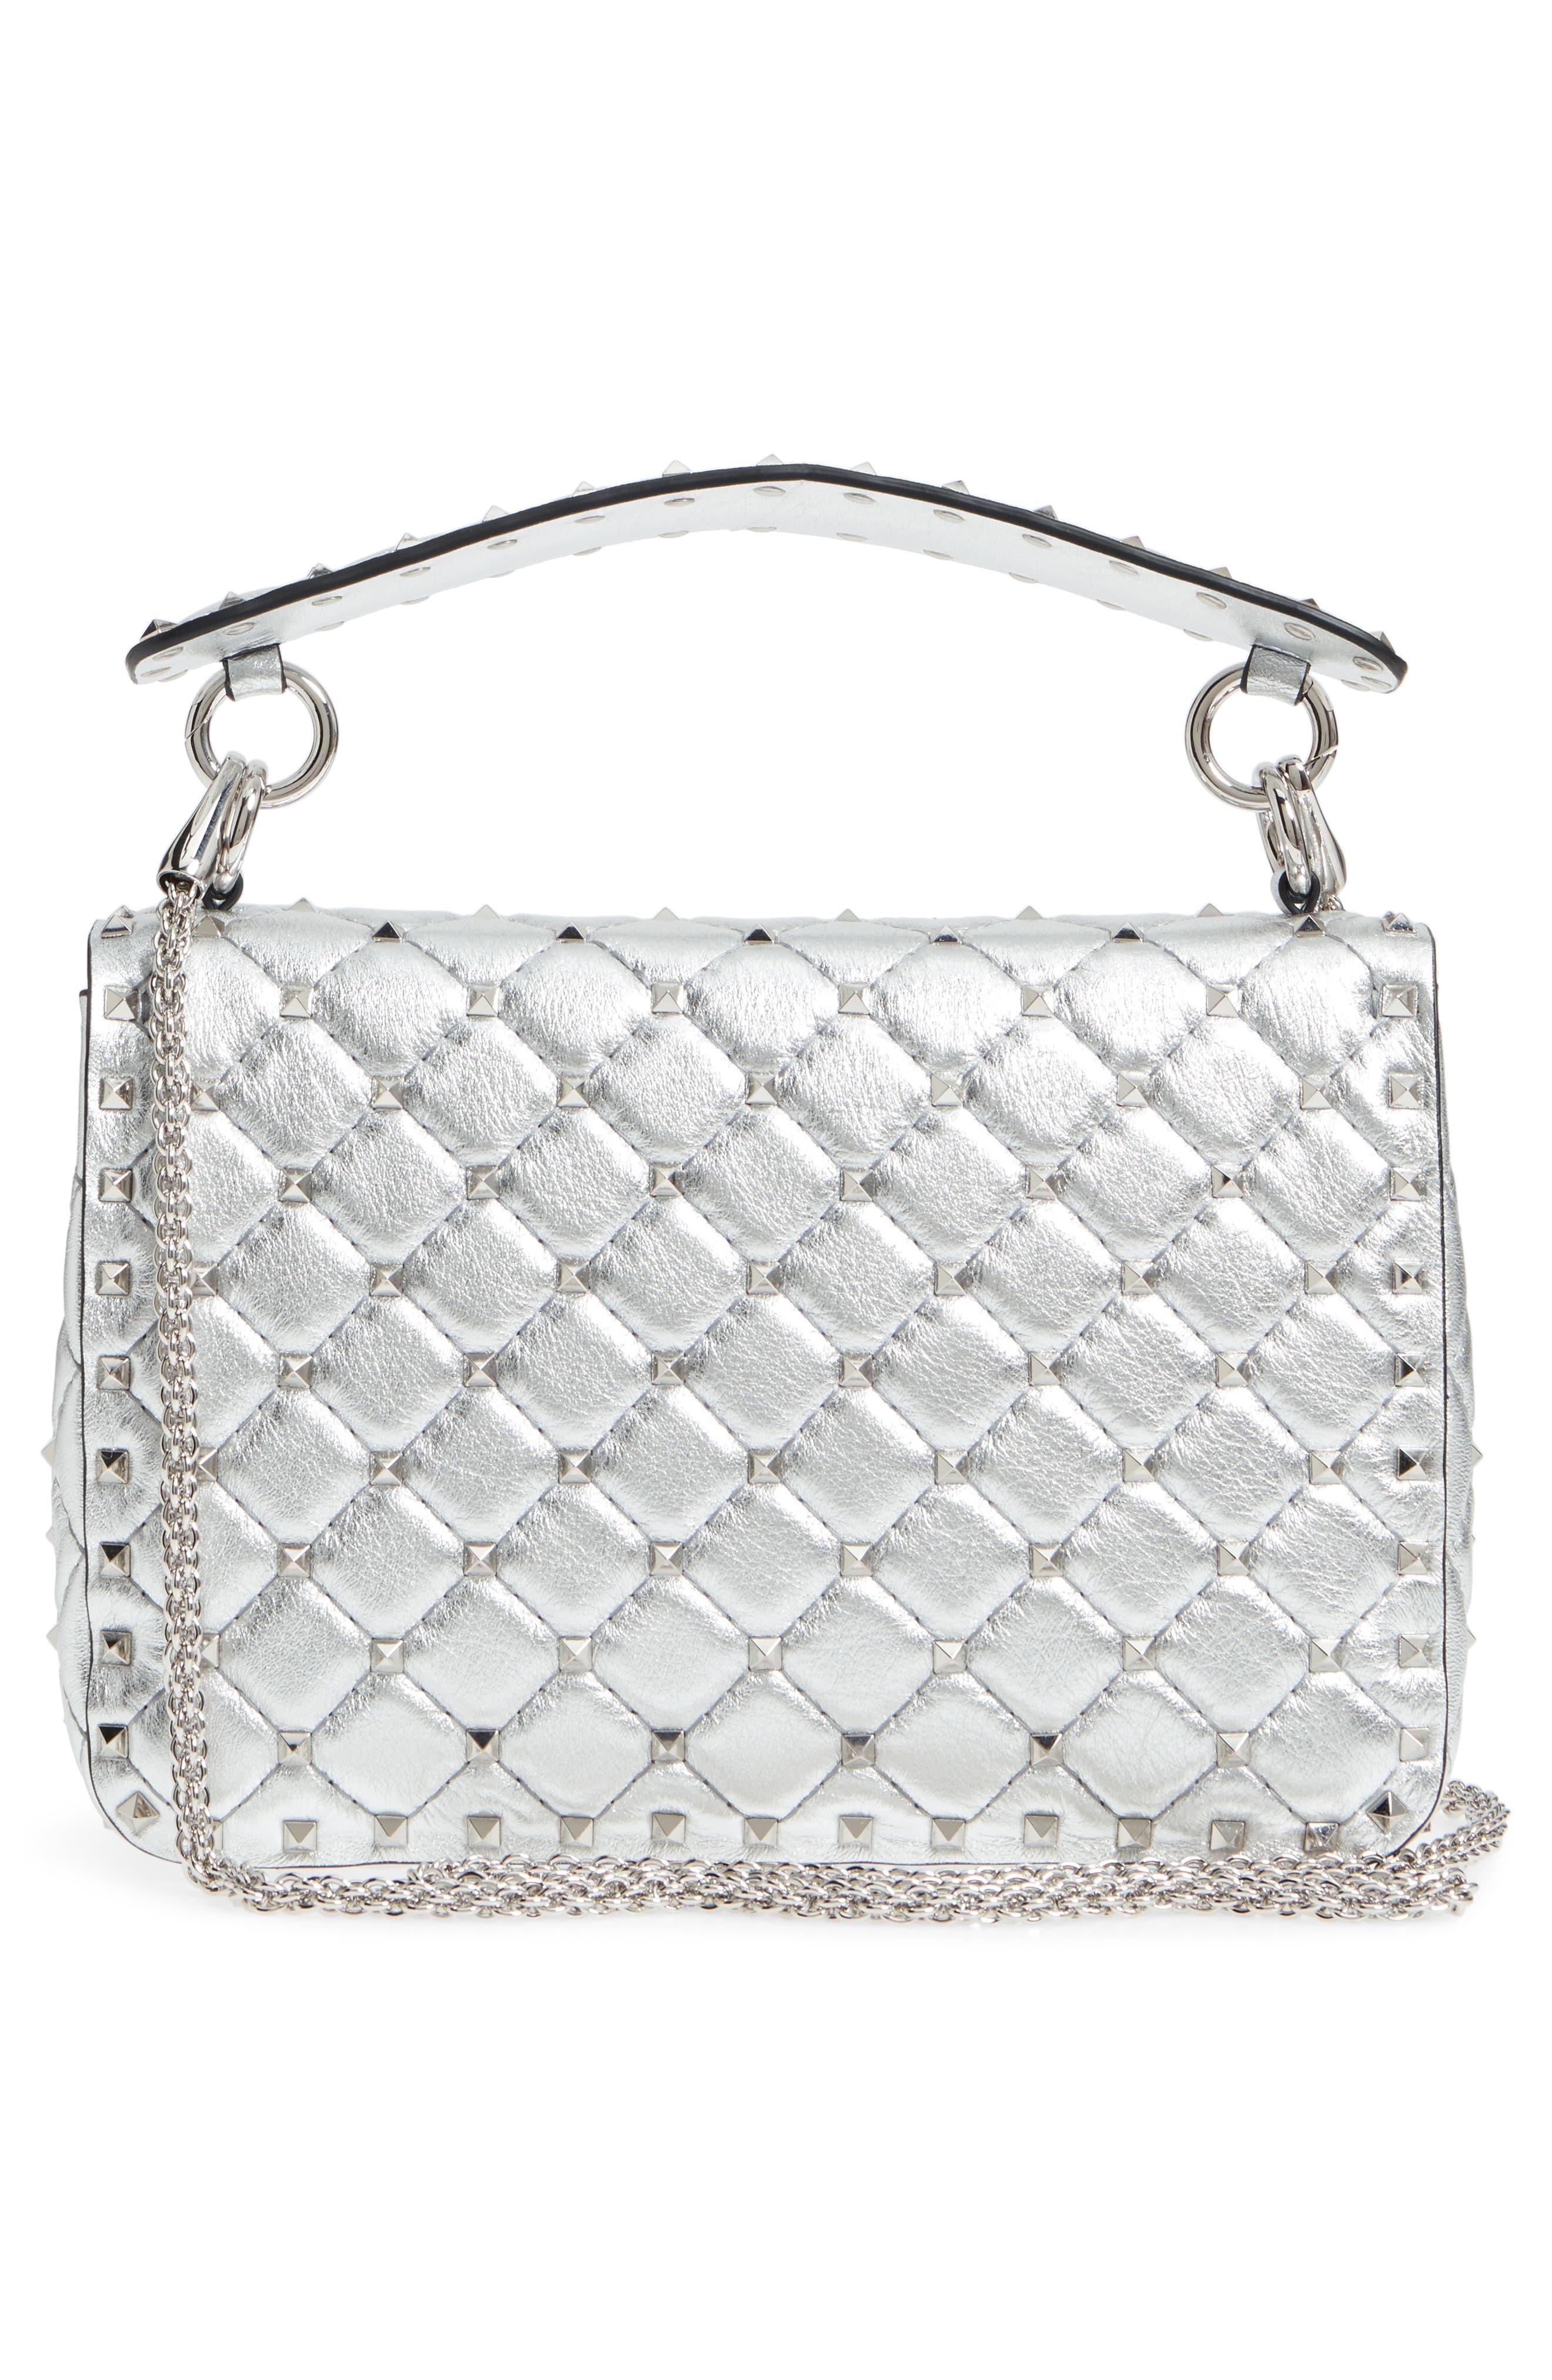 Medium Rockstud Spike Metallic Leather Shoulder Bag,                             Alternate thumbnail 3, color,                             Silver